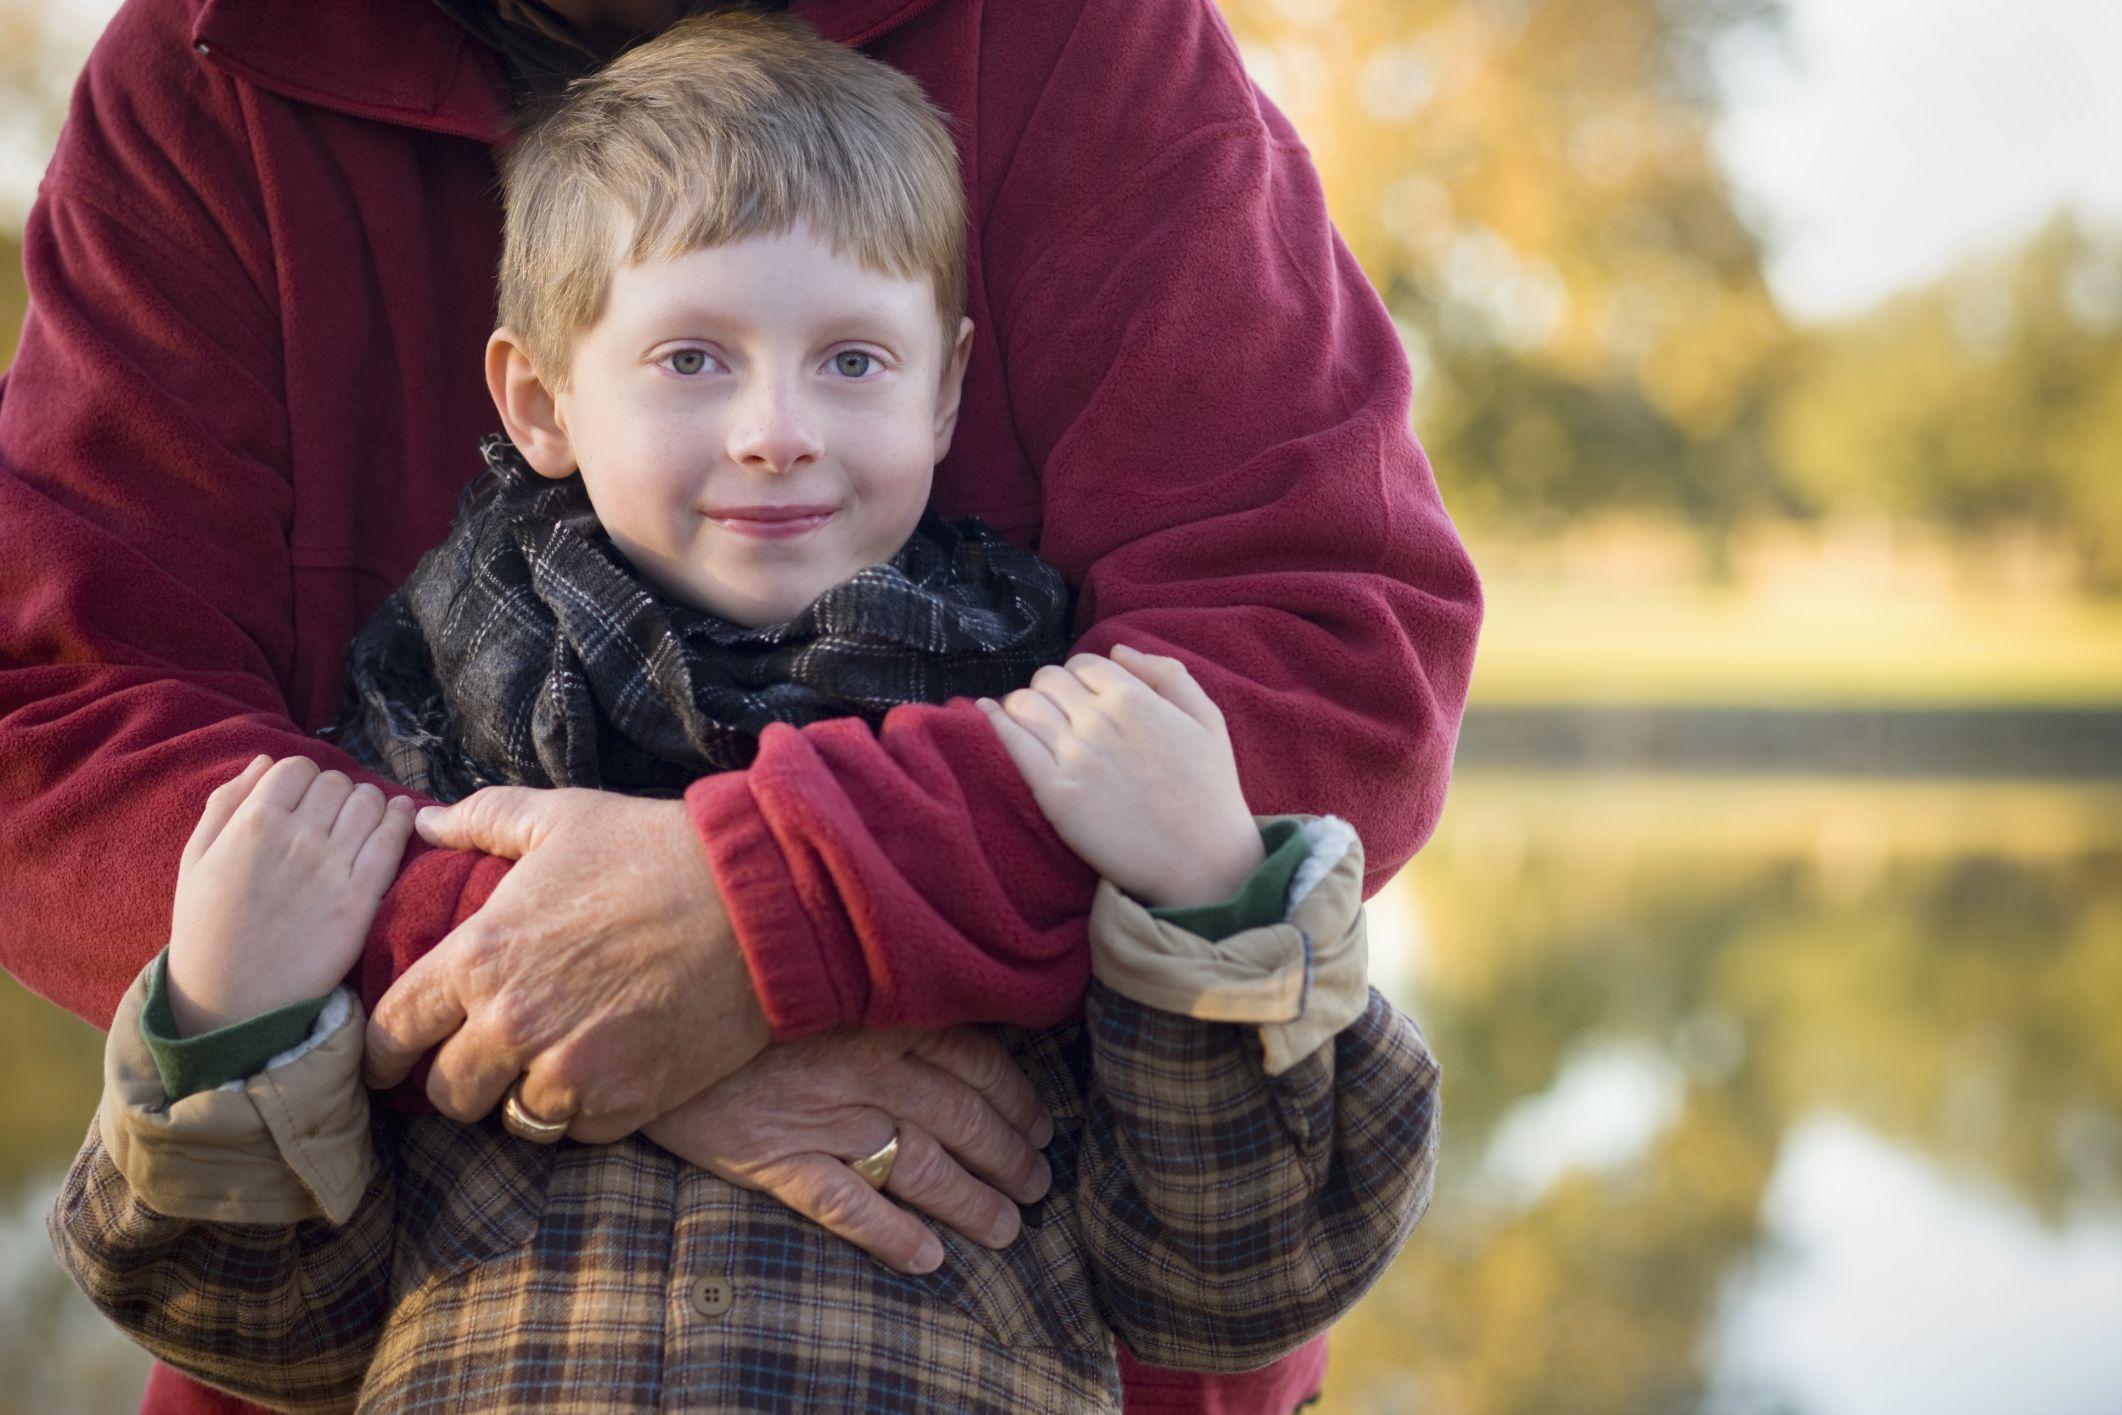 Why Children Need Grandparents | Grandparents raising ...